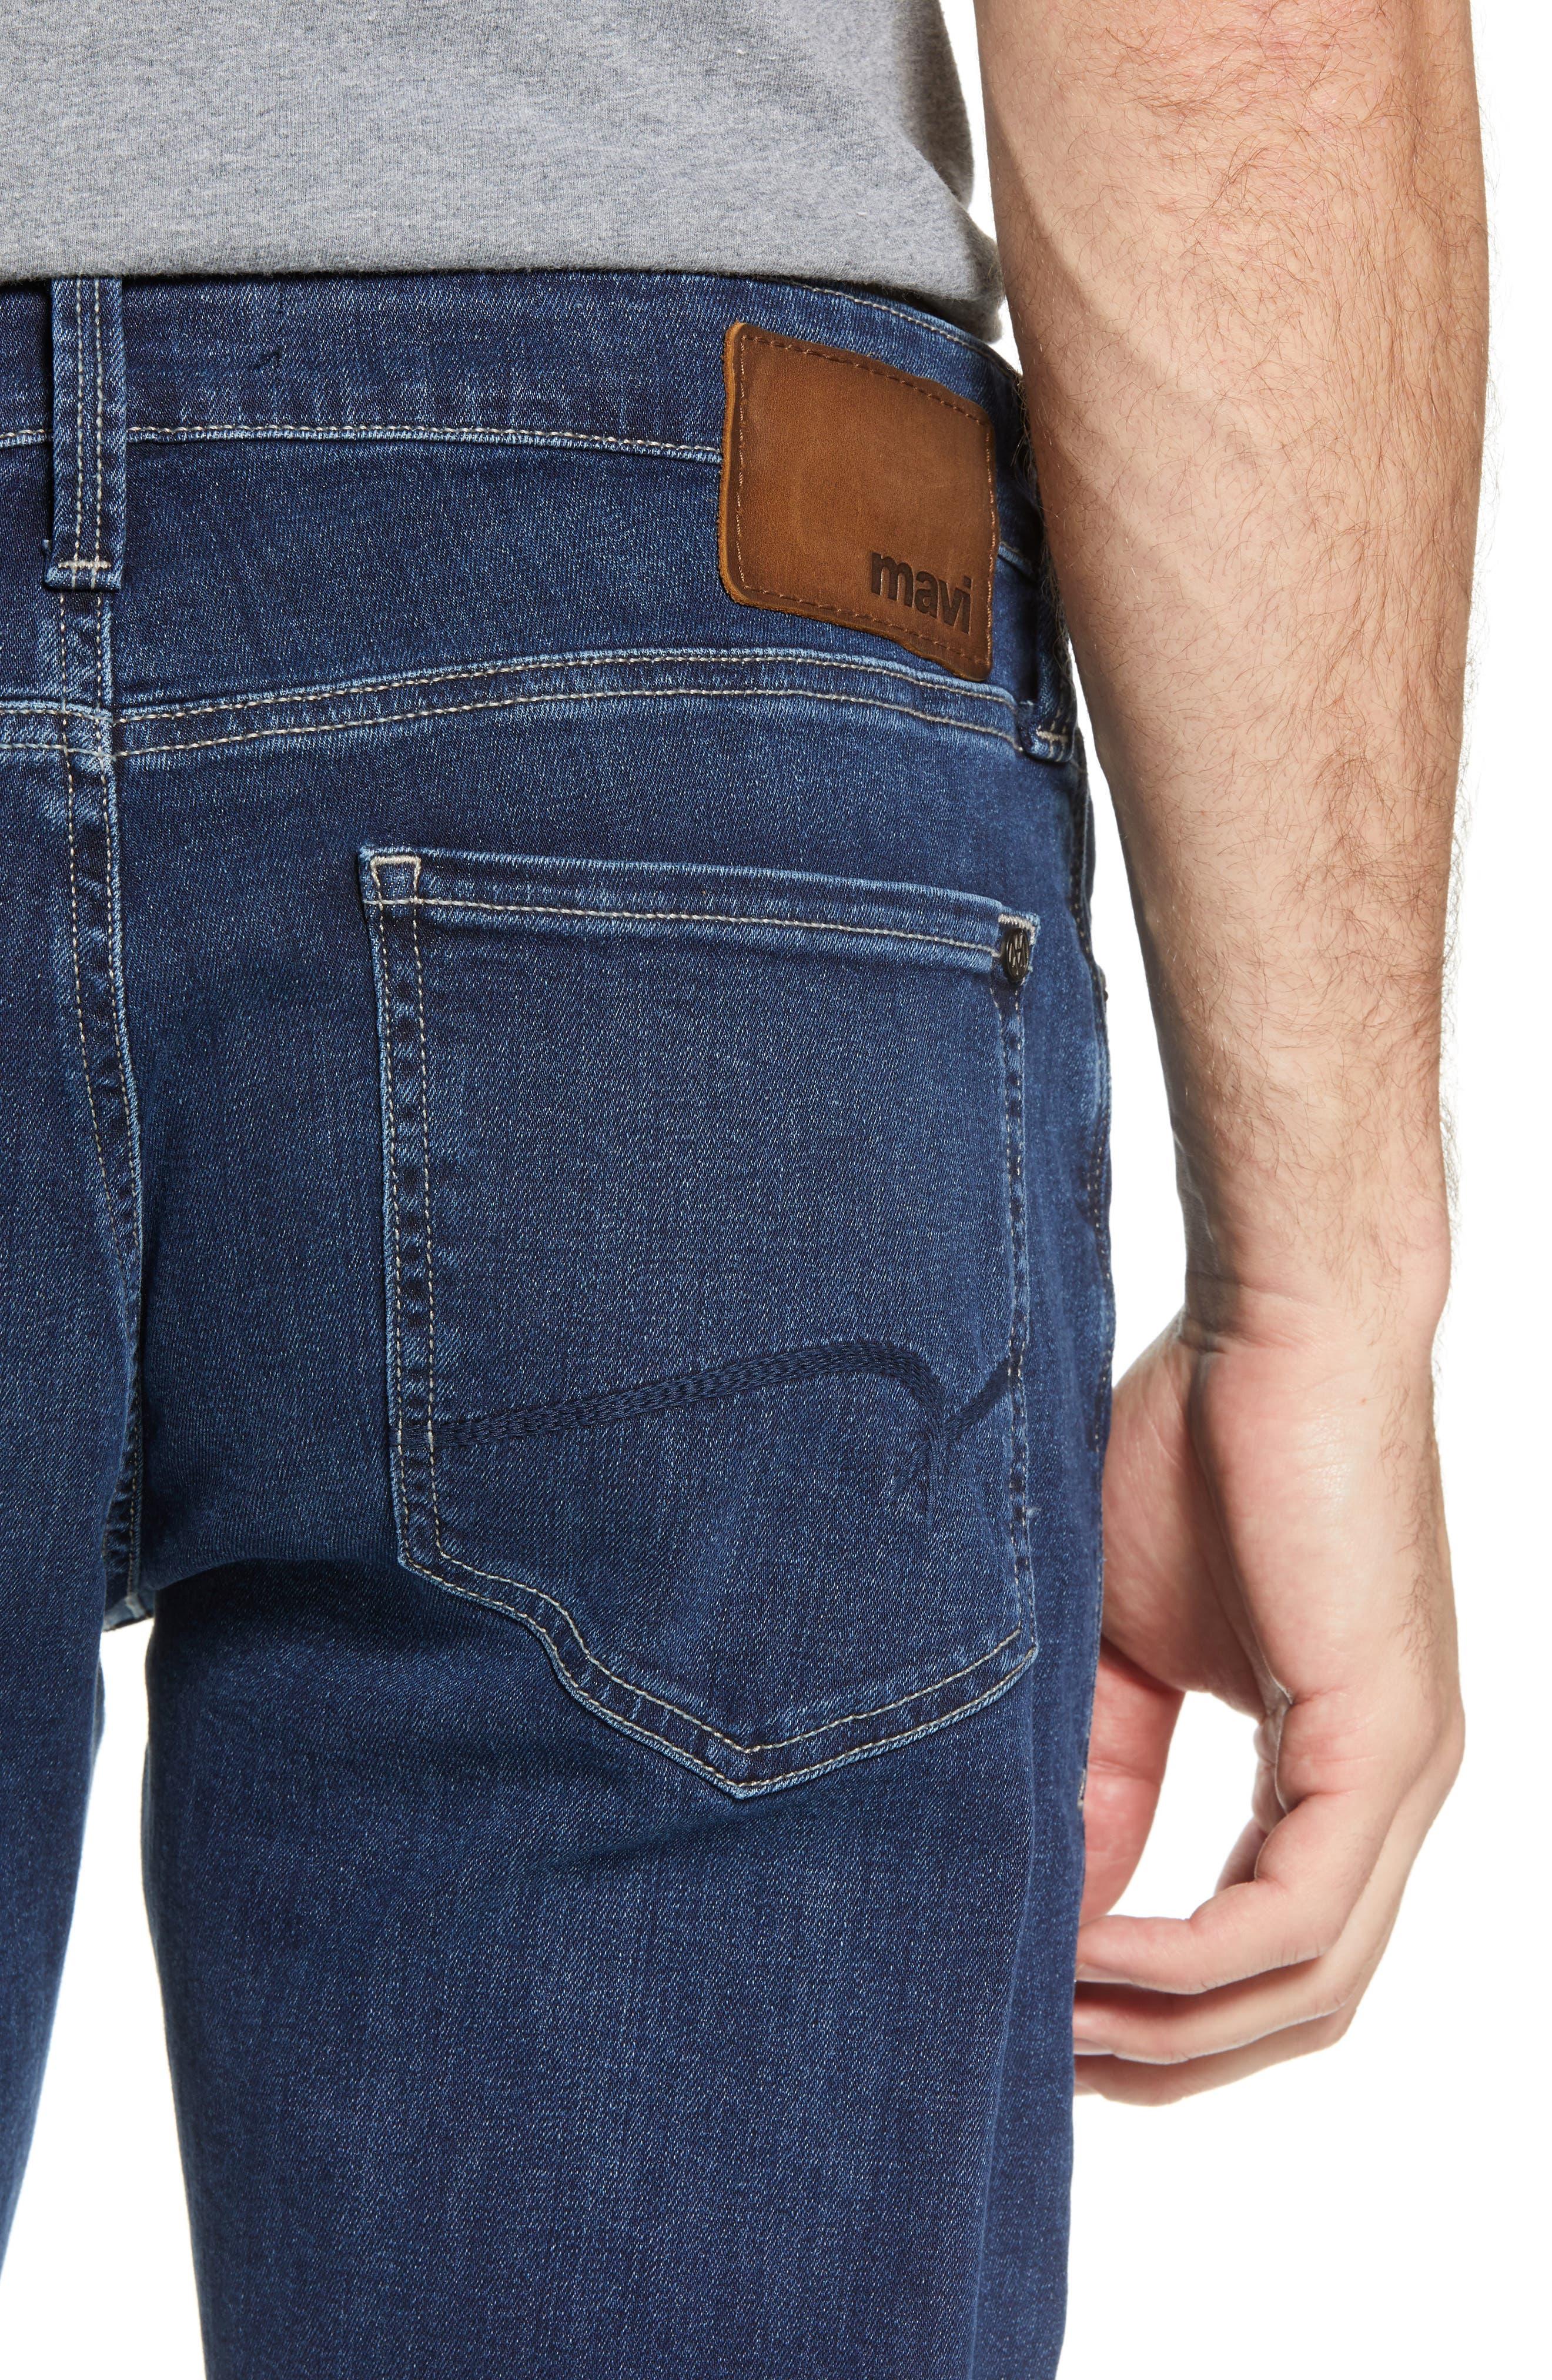 Zach Straight Leg Jeans,                             Alternate thumbnail 4, color,                             Dark Blue Williamsburg